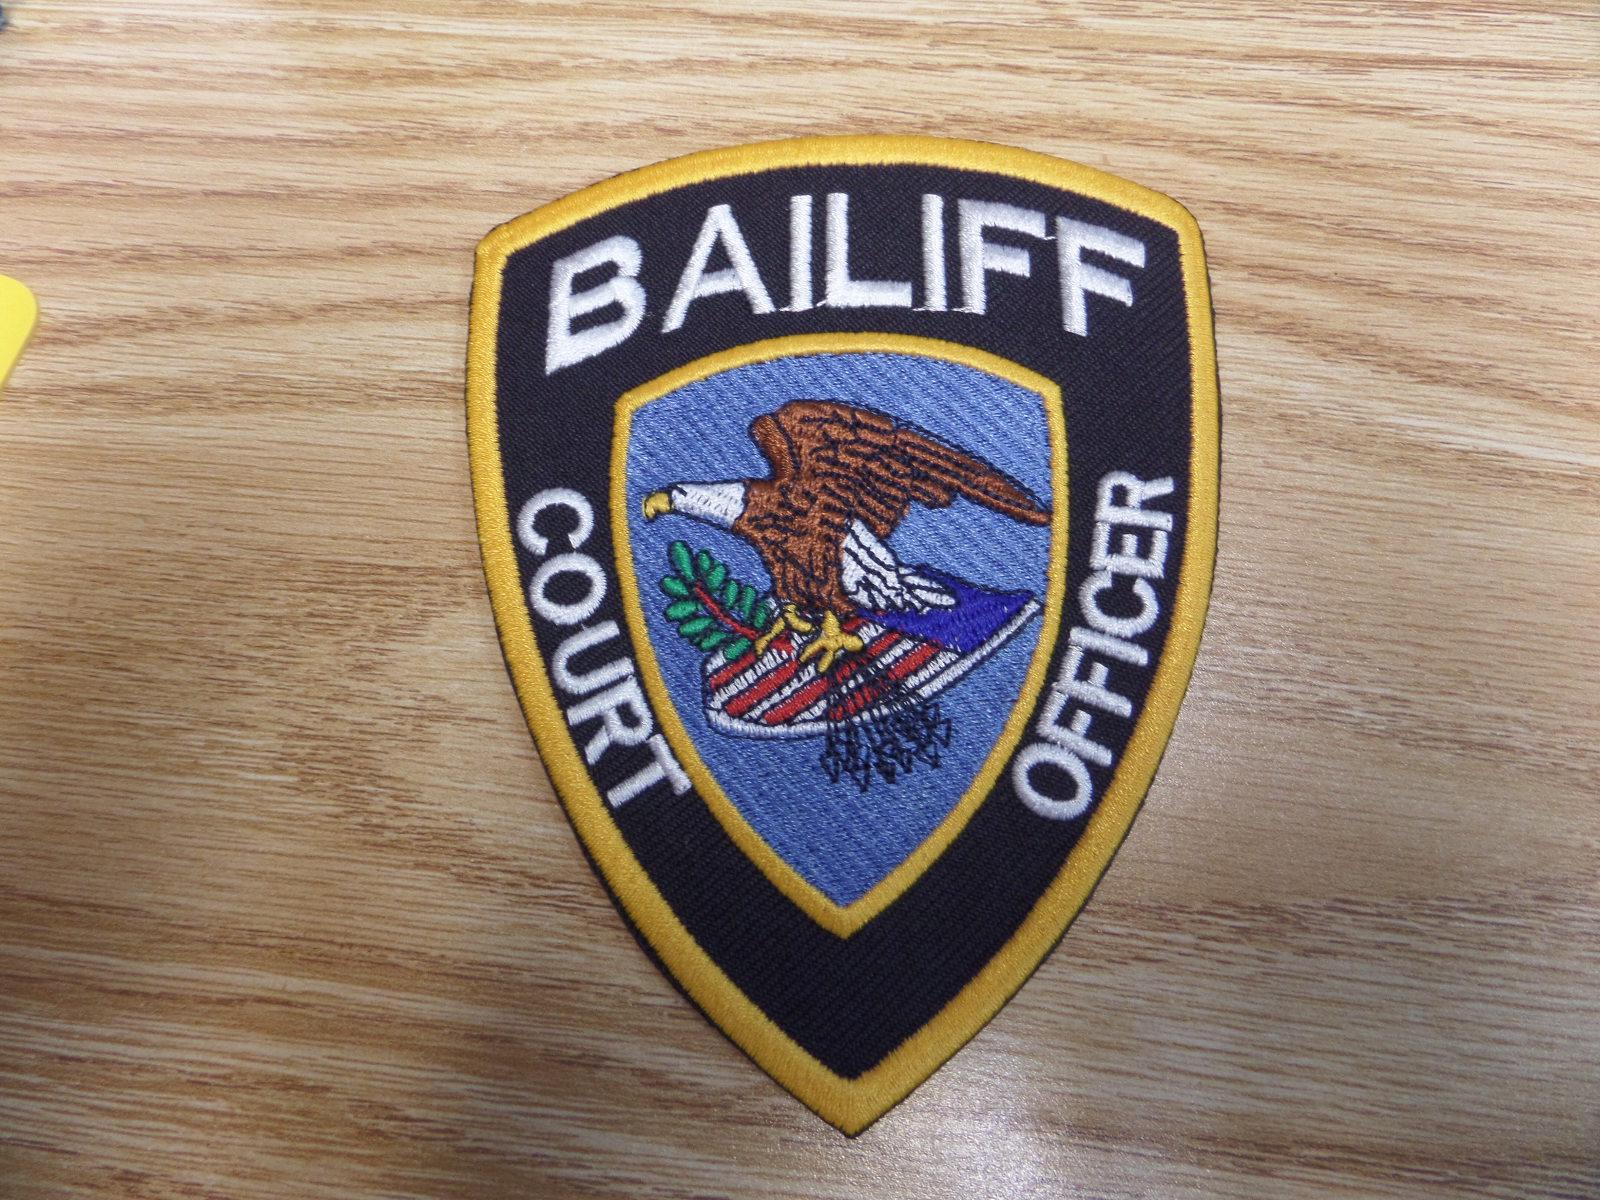 BAILIFF SHOULDER PATCH Miami Prop Rental